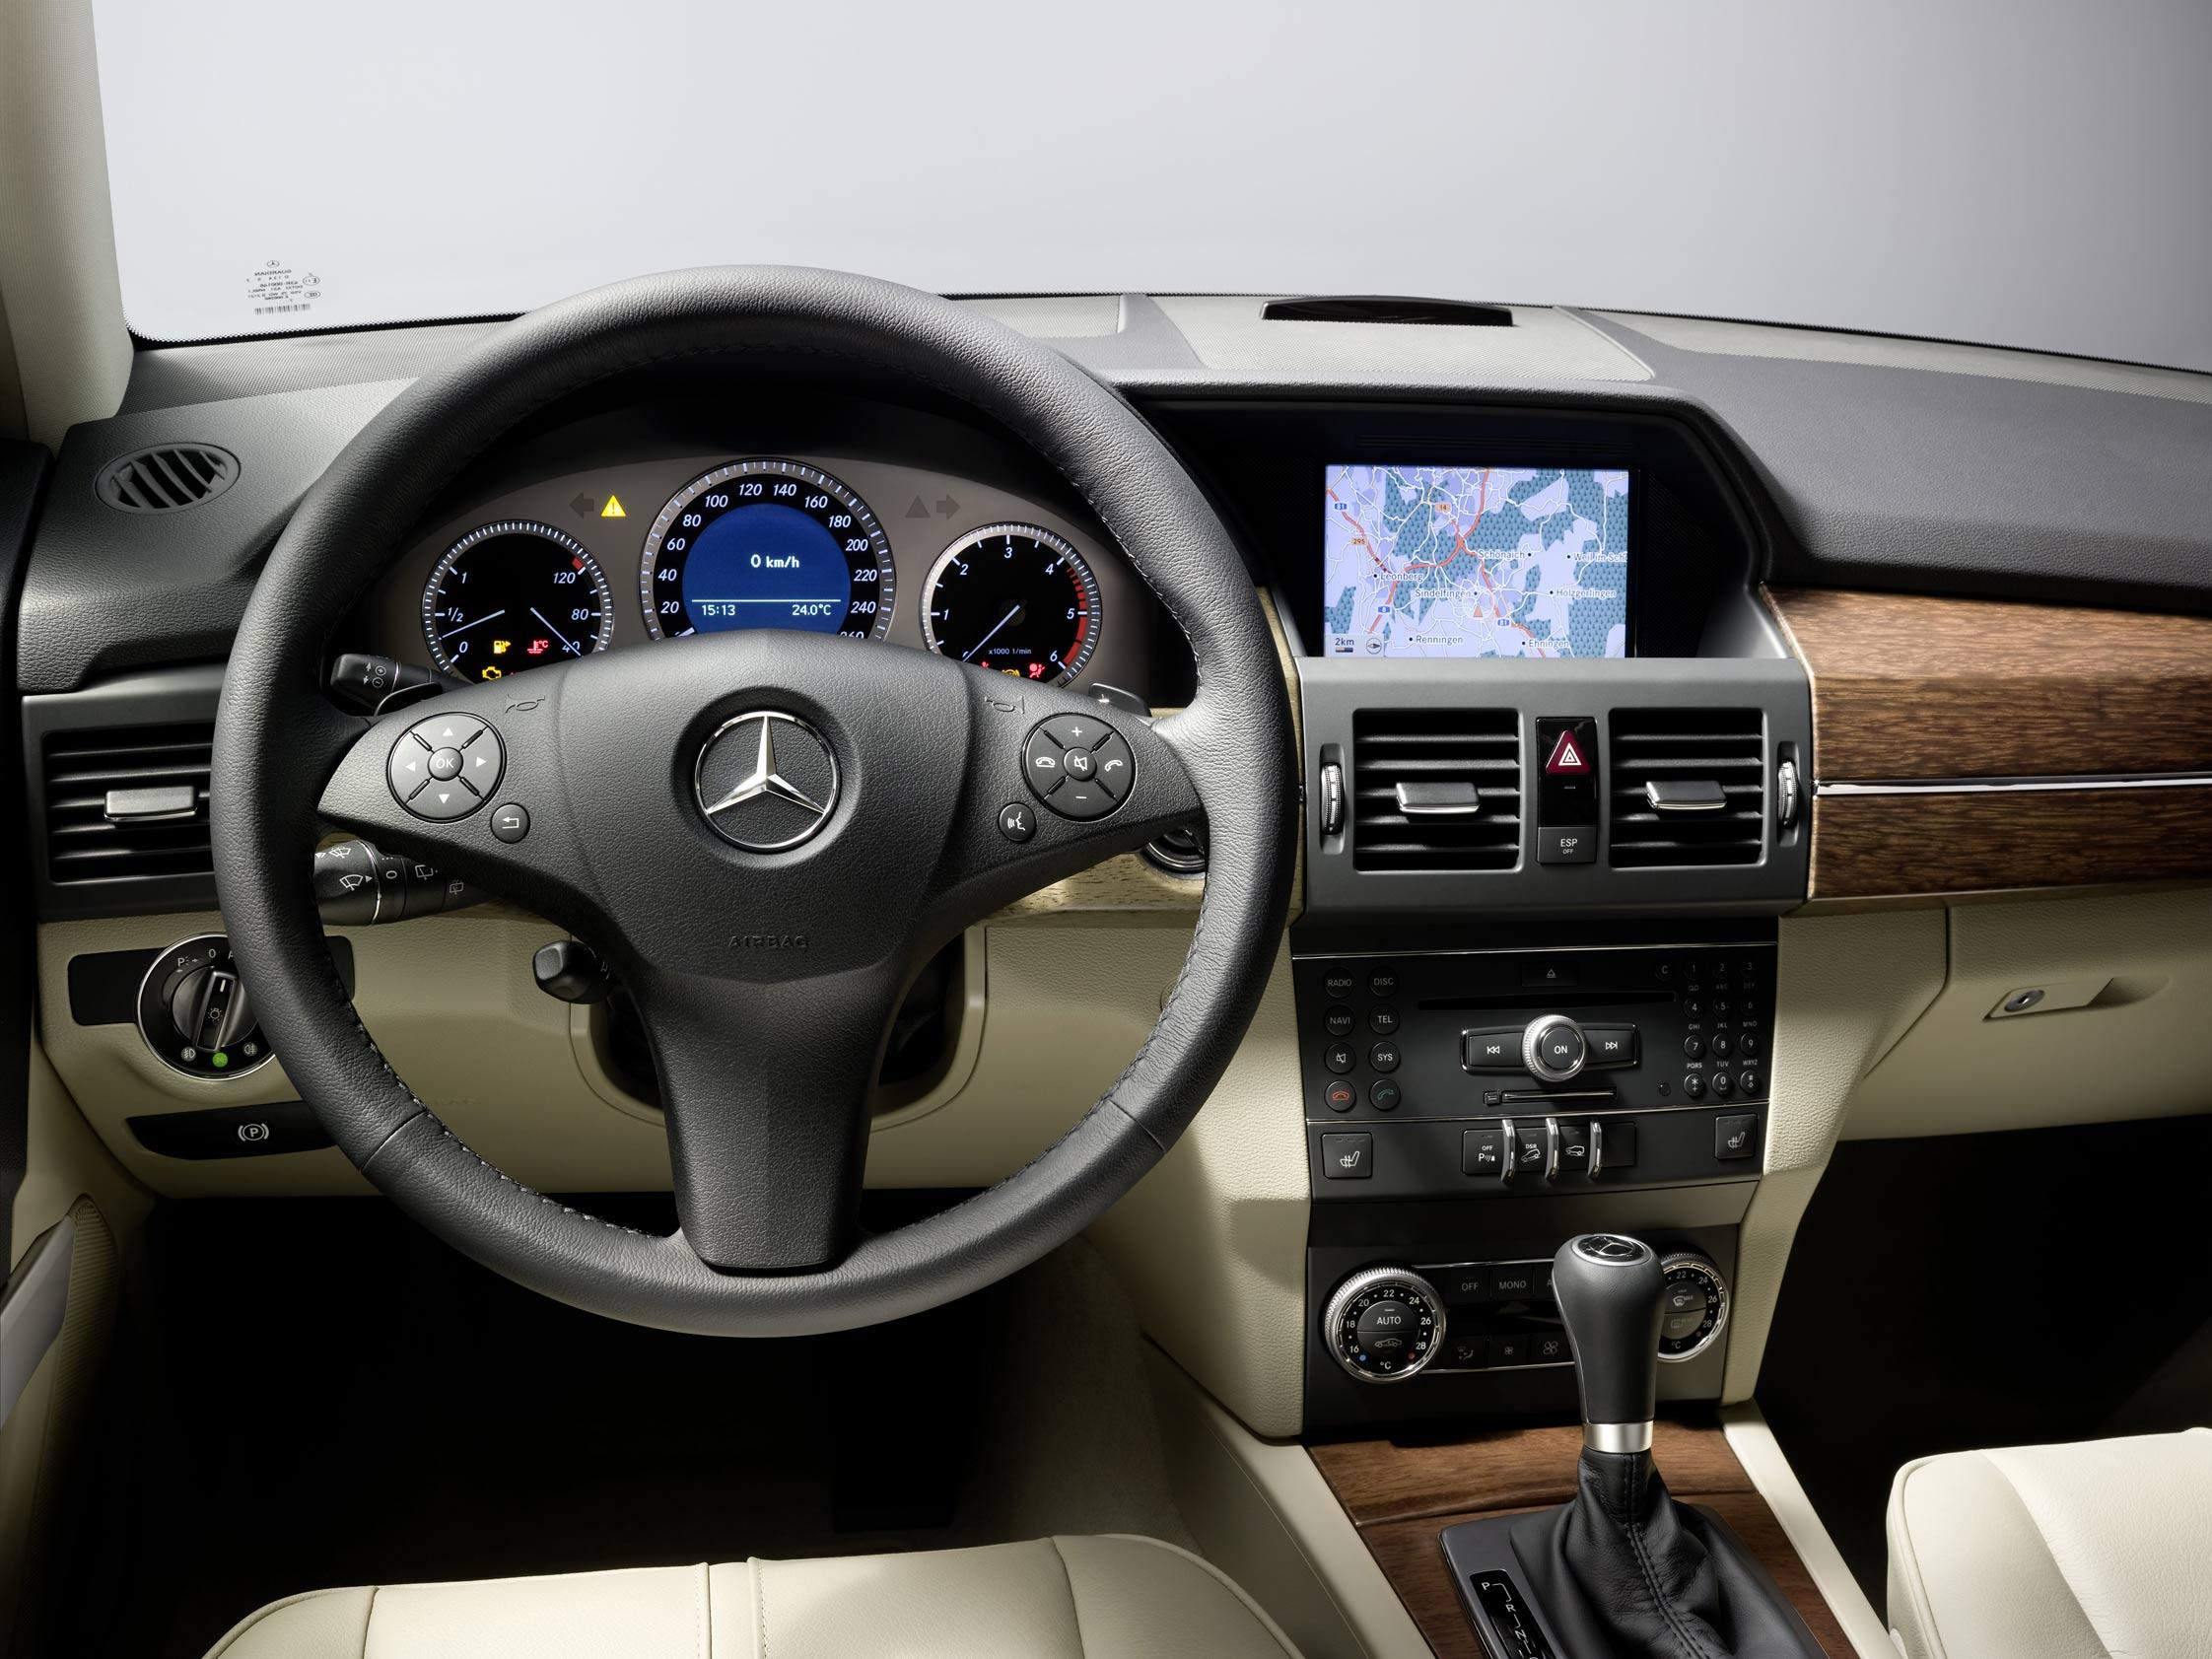 Essai mercedes glk 320 cdi motorlegend for Cdi interior design